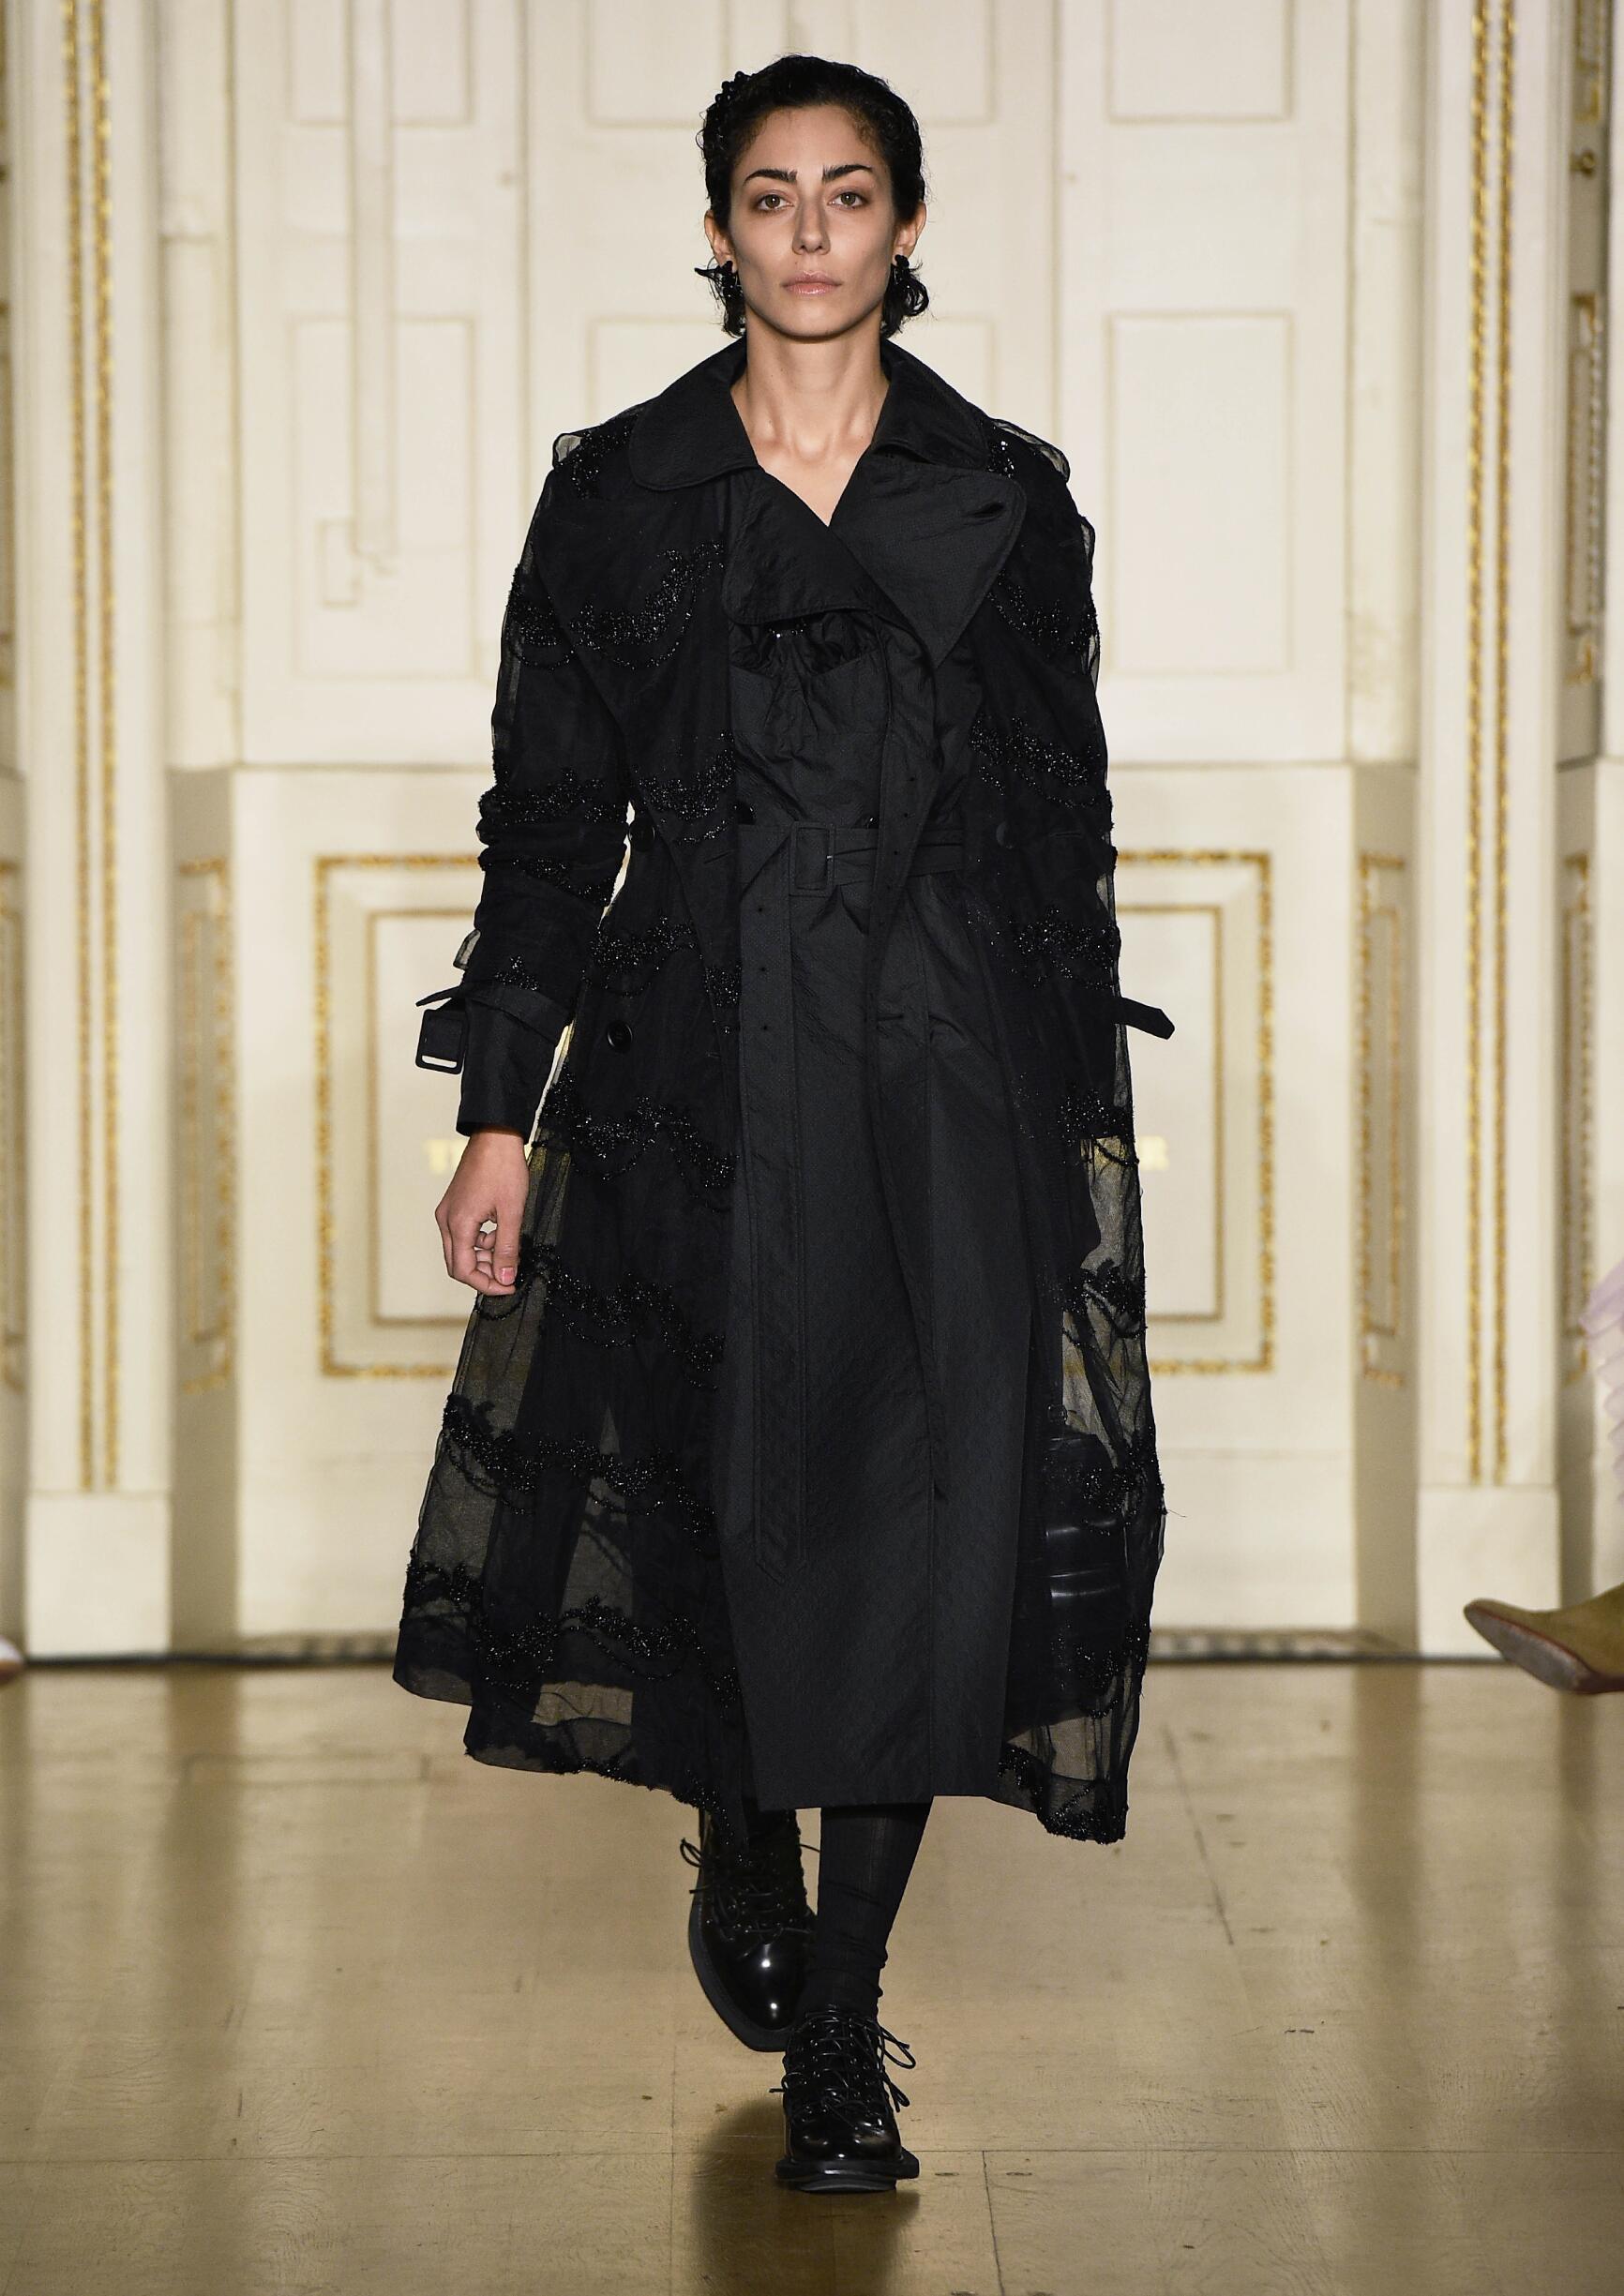 Simone Rocha Fashion Show FW 2019